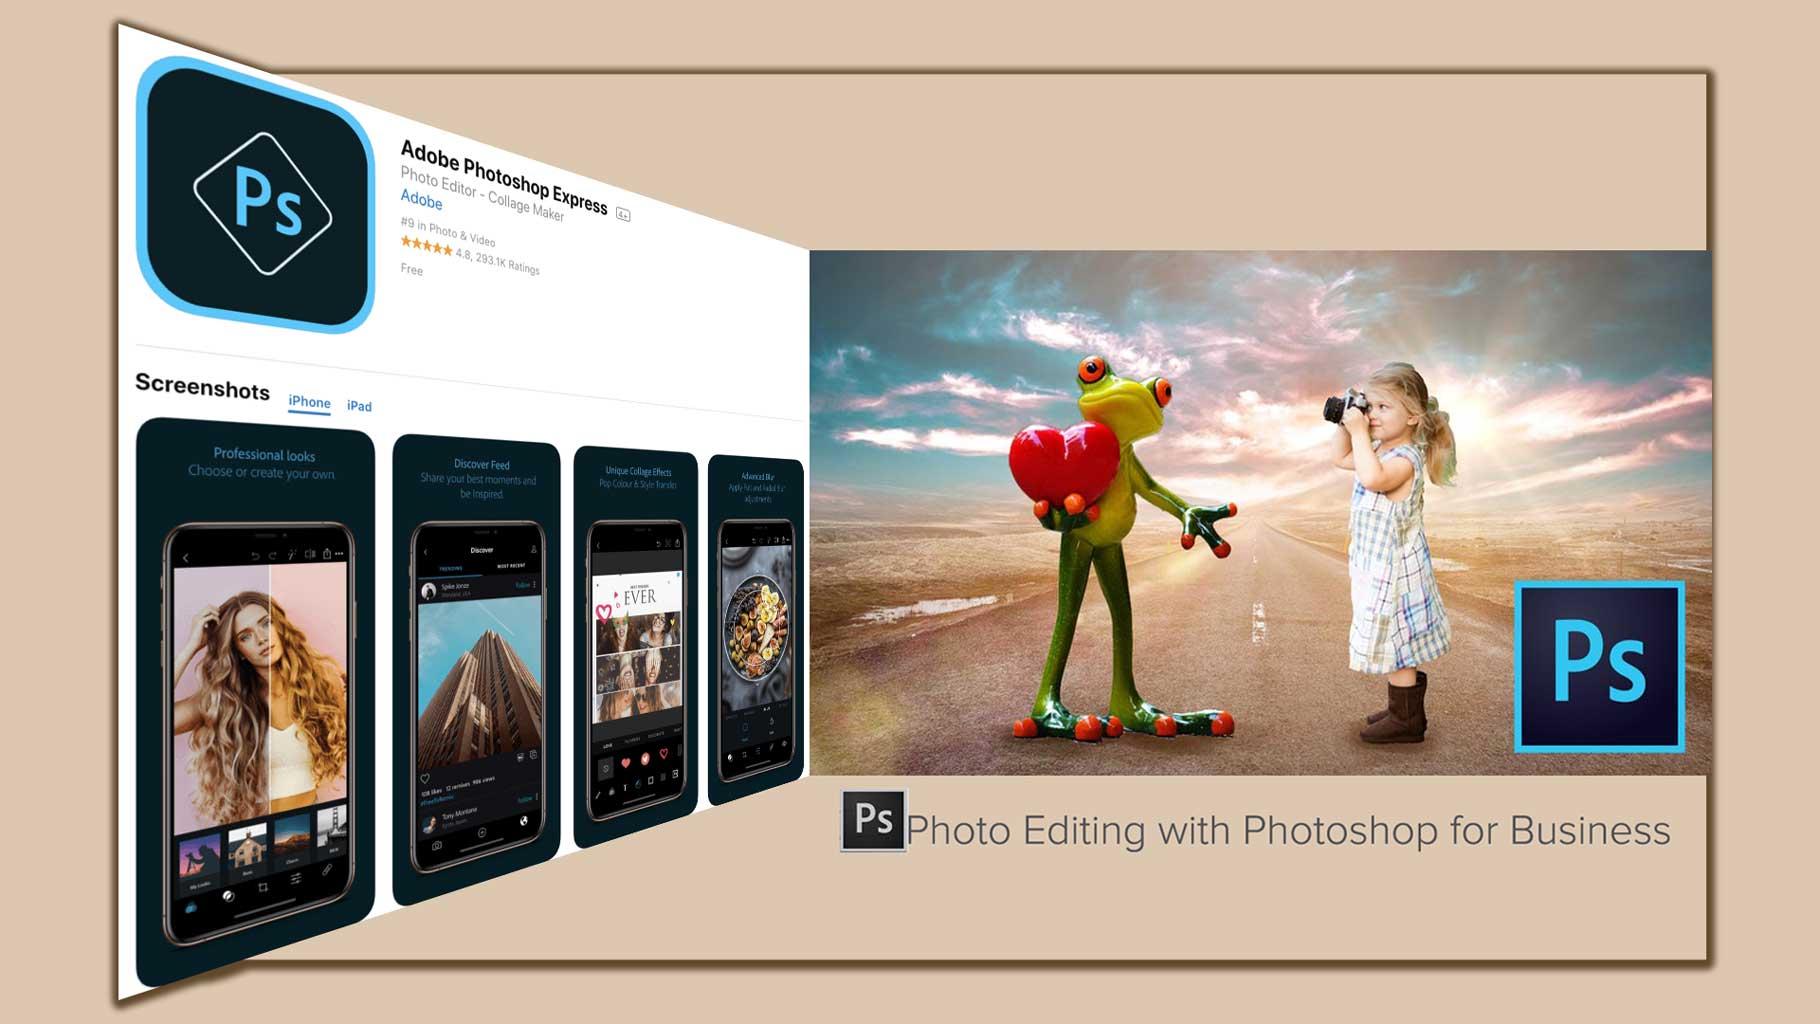 Photo editing  Photoshop 111 - 8 تا از مزایای اصلی ویرایش عکس با فتوشاپ برای کسب و کارتان